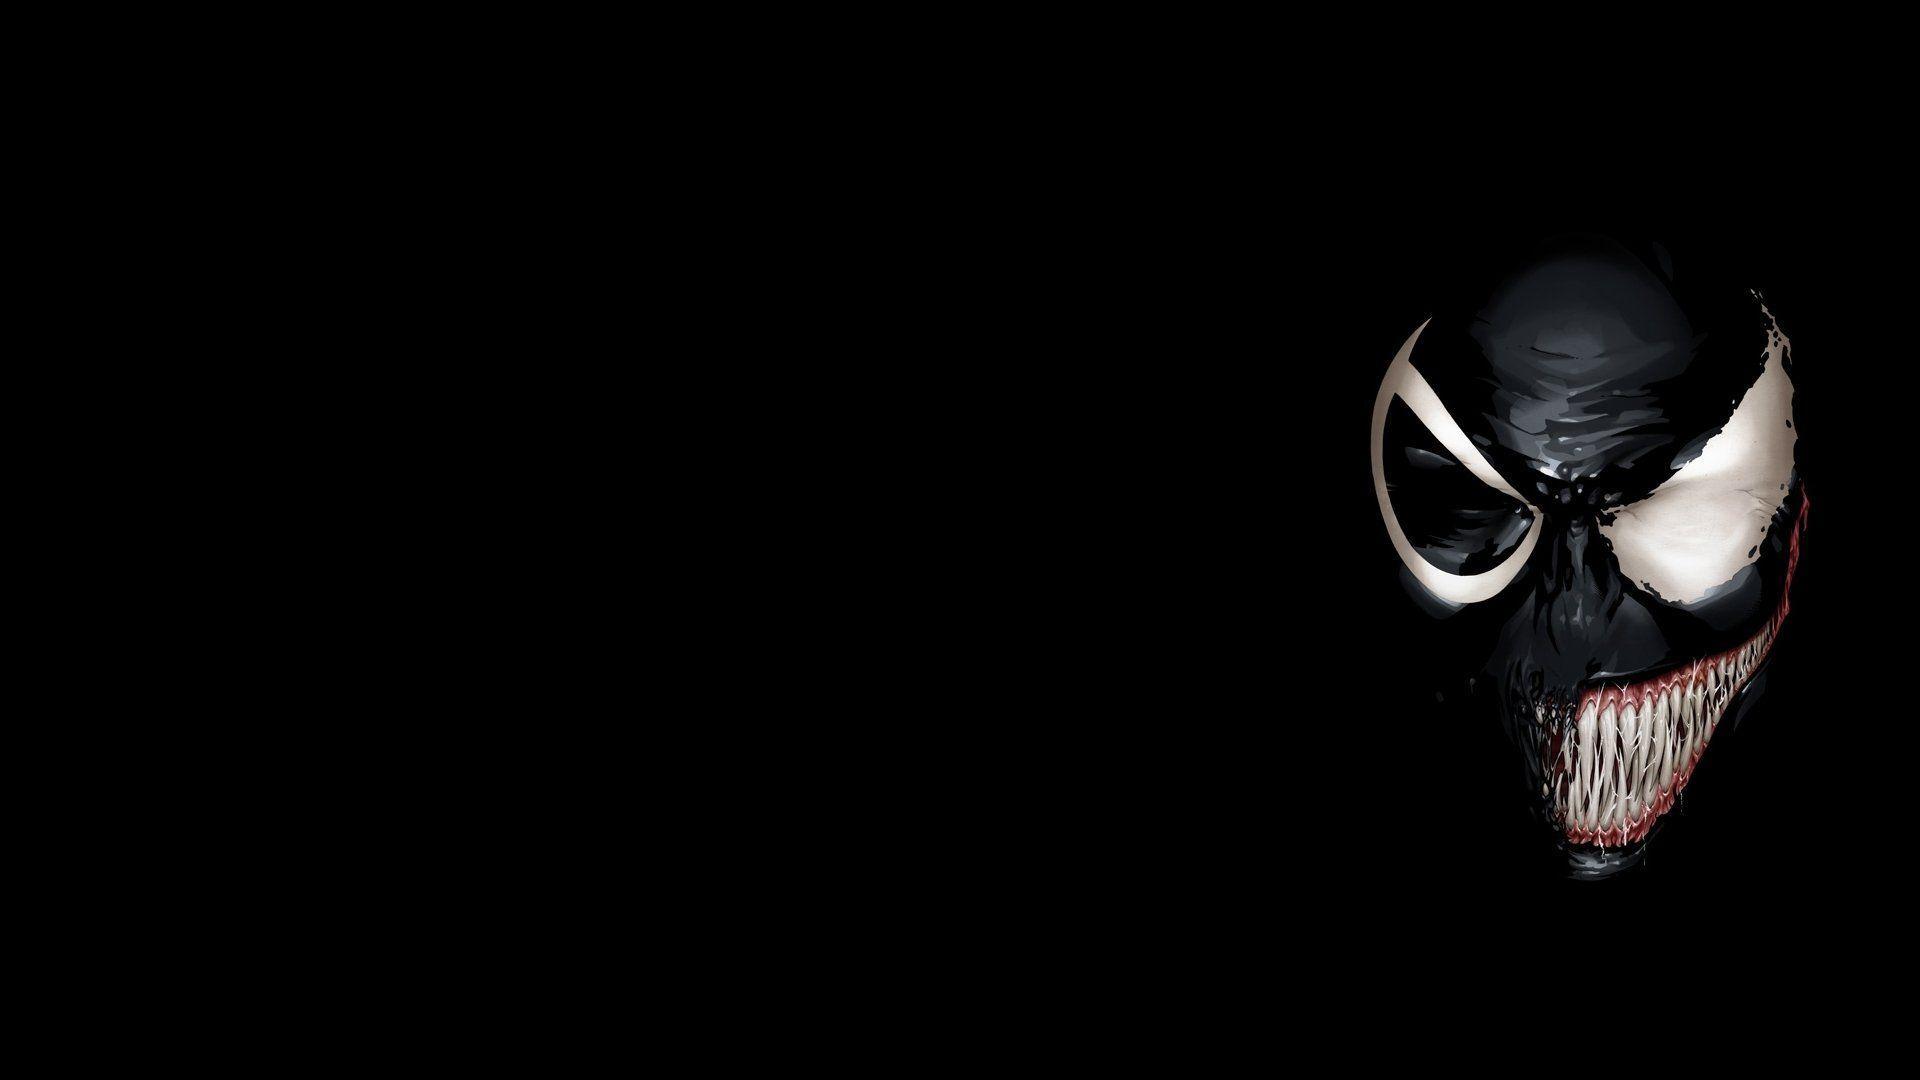 Venom Movie Full Hd Laptop Wallpapers Top Free Venom Movie Full Hd Laptop Backgrounds Wallpaperaccess